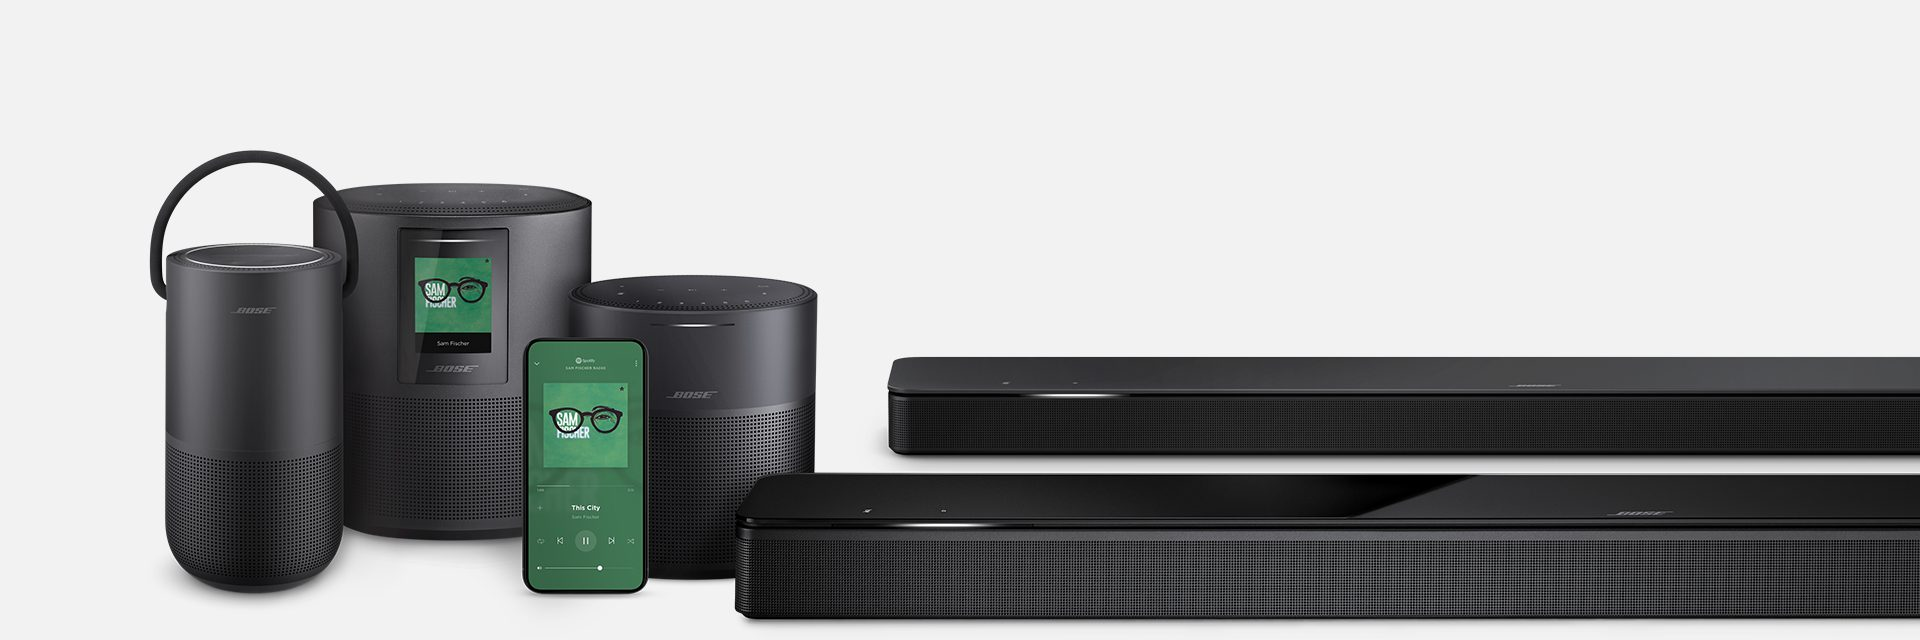 Bose Home Speaker 500 - Smart speaker - Bluetooth, Wi-Fi